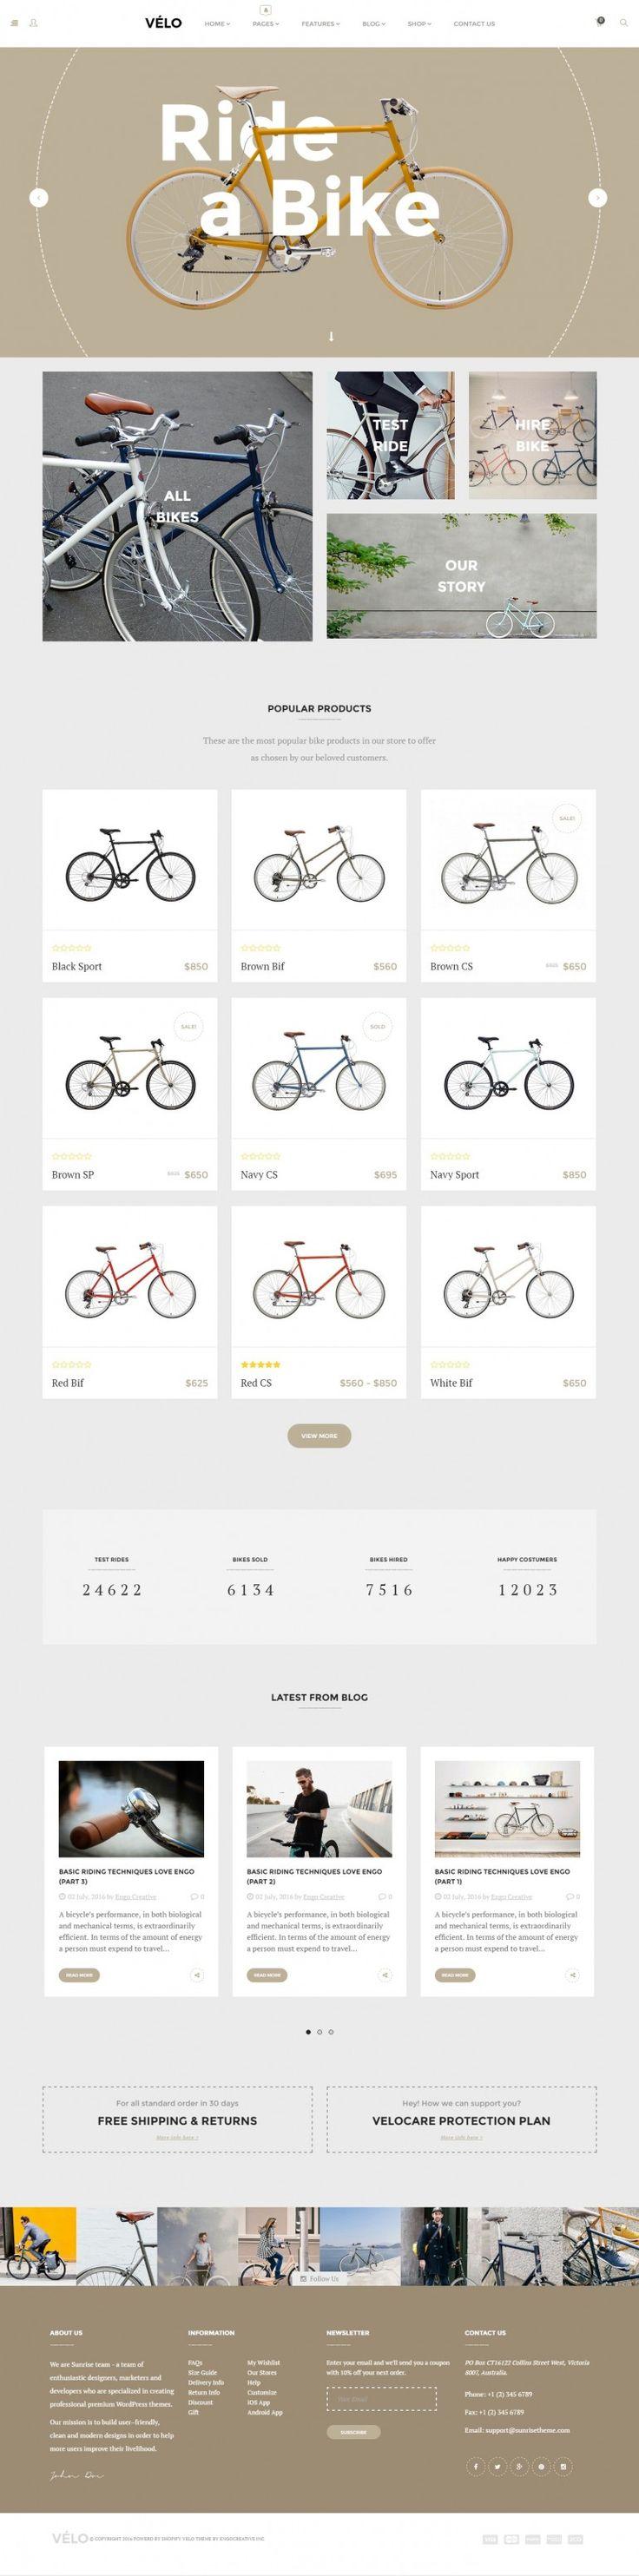 Velo – Bike Store